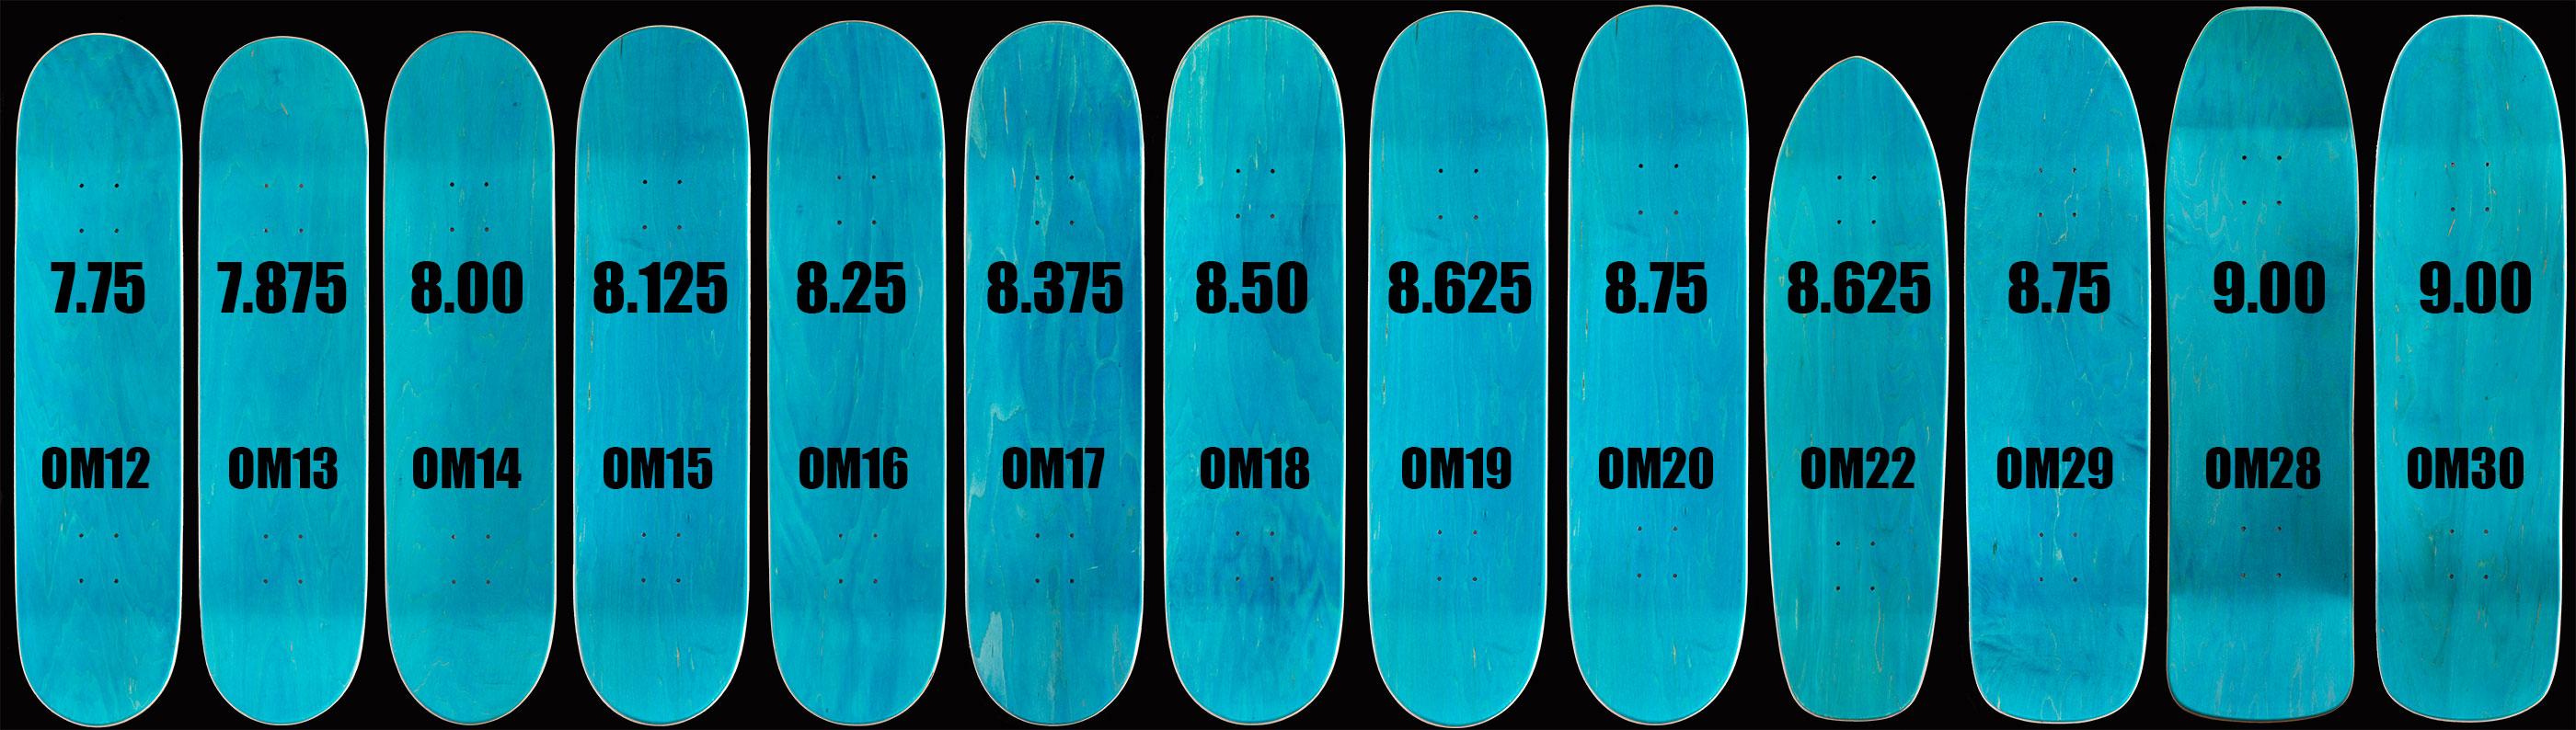 omni-board-range-2018.jpg